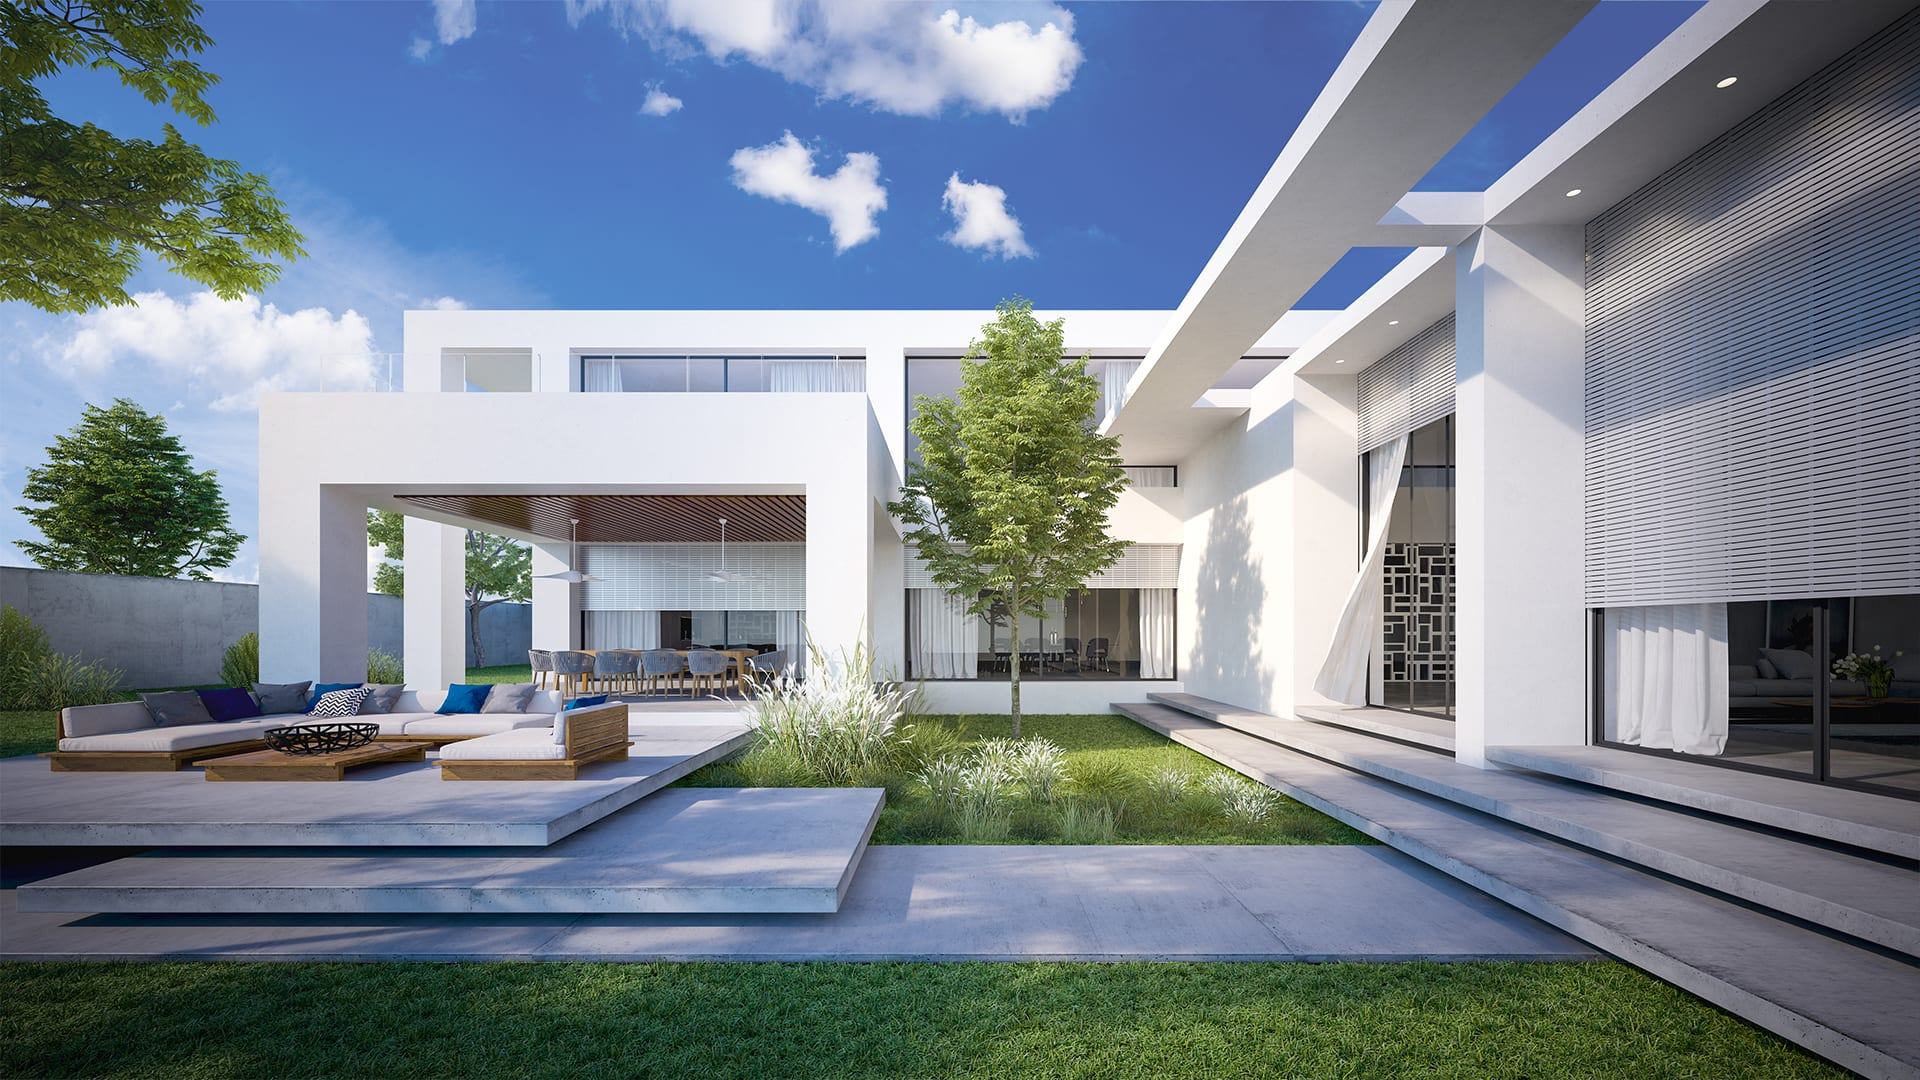 Maayan-Golan_Architectural-Visualization_product-visualization_Scroll-shutter_ROLLANOVA_modern-house_02